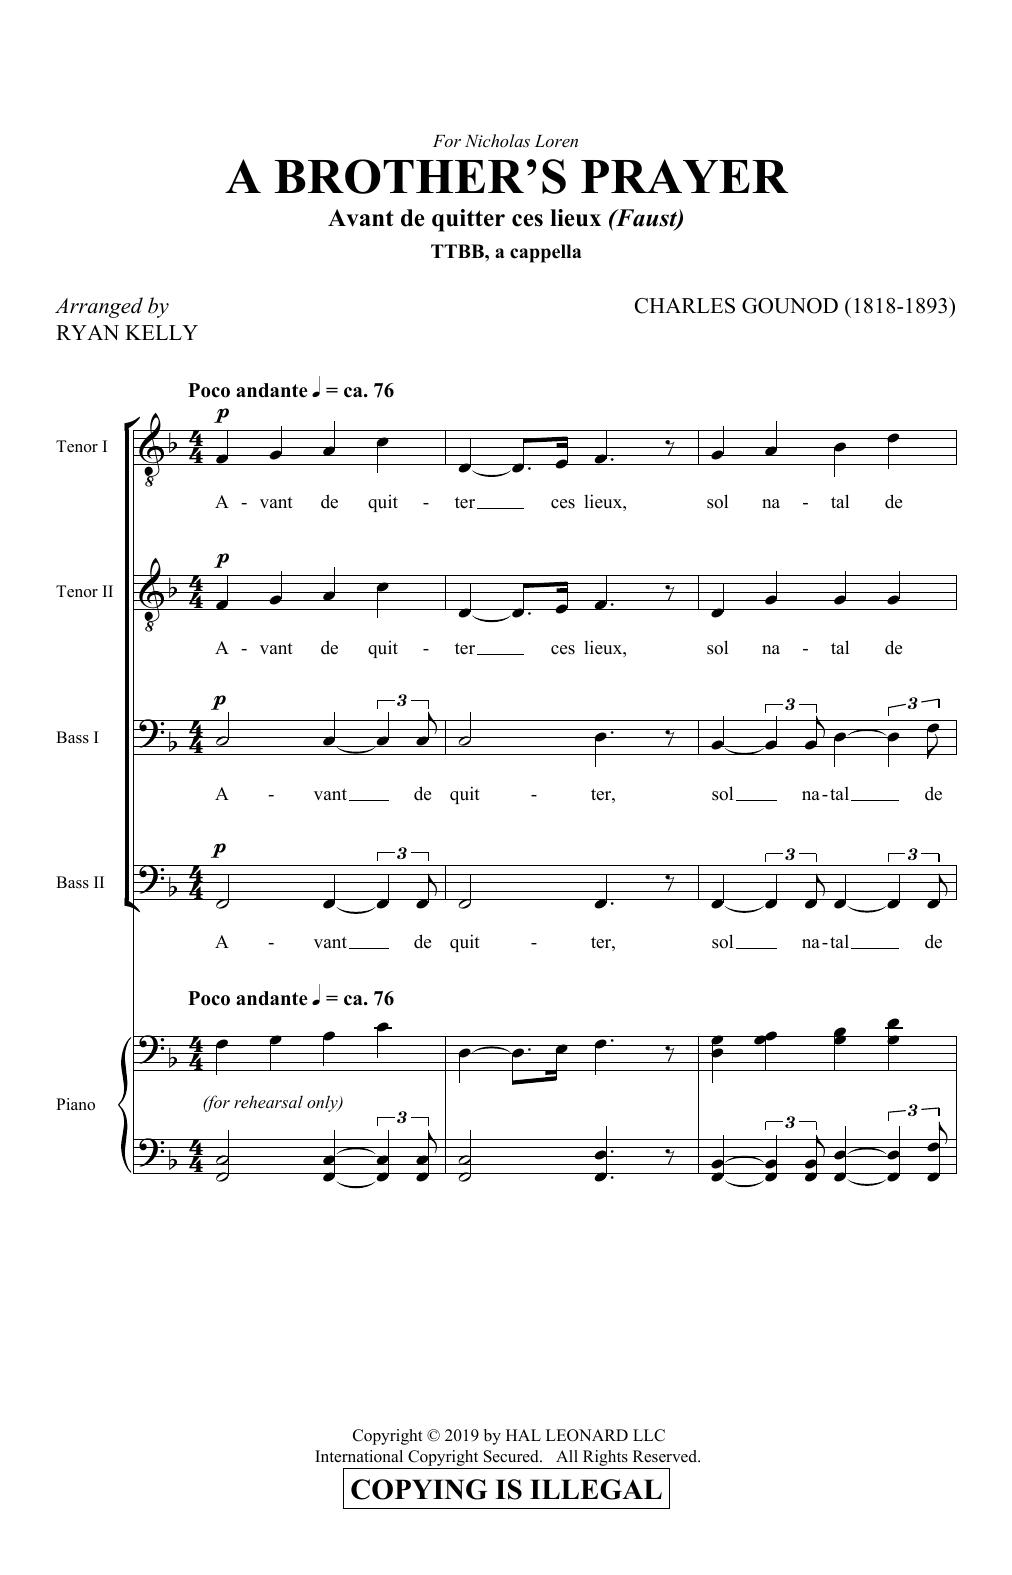 A Brother's Prayer (Avant de quitter ces lieux) (arr. Ryan Kelly) (TTBB Choir)